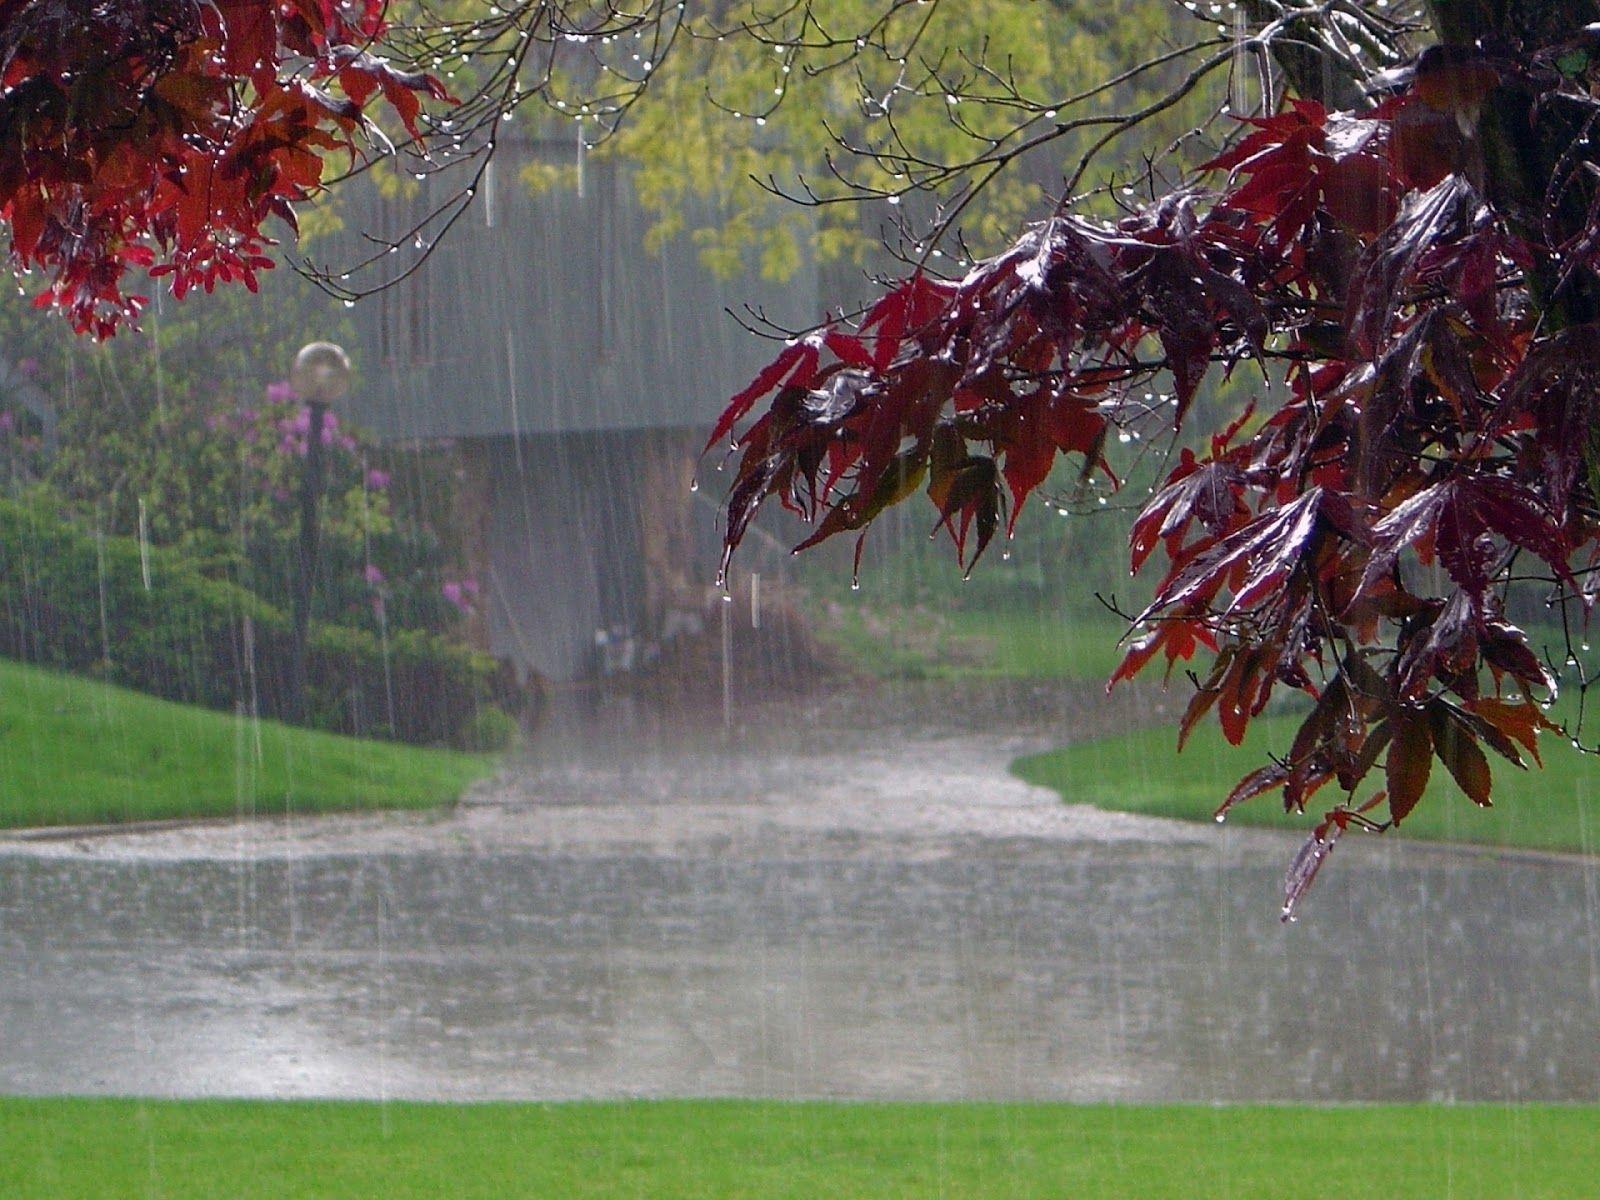 Rain Nature Wallpaper - HD Wallpapers, HQ Photos & Desktop ...